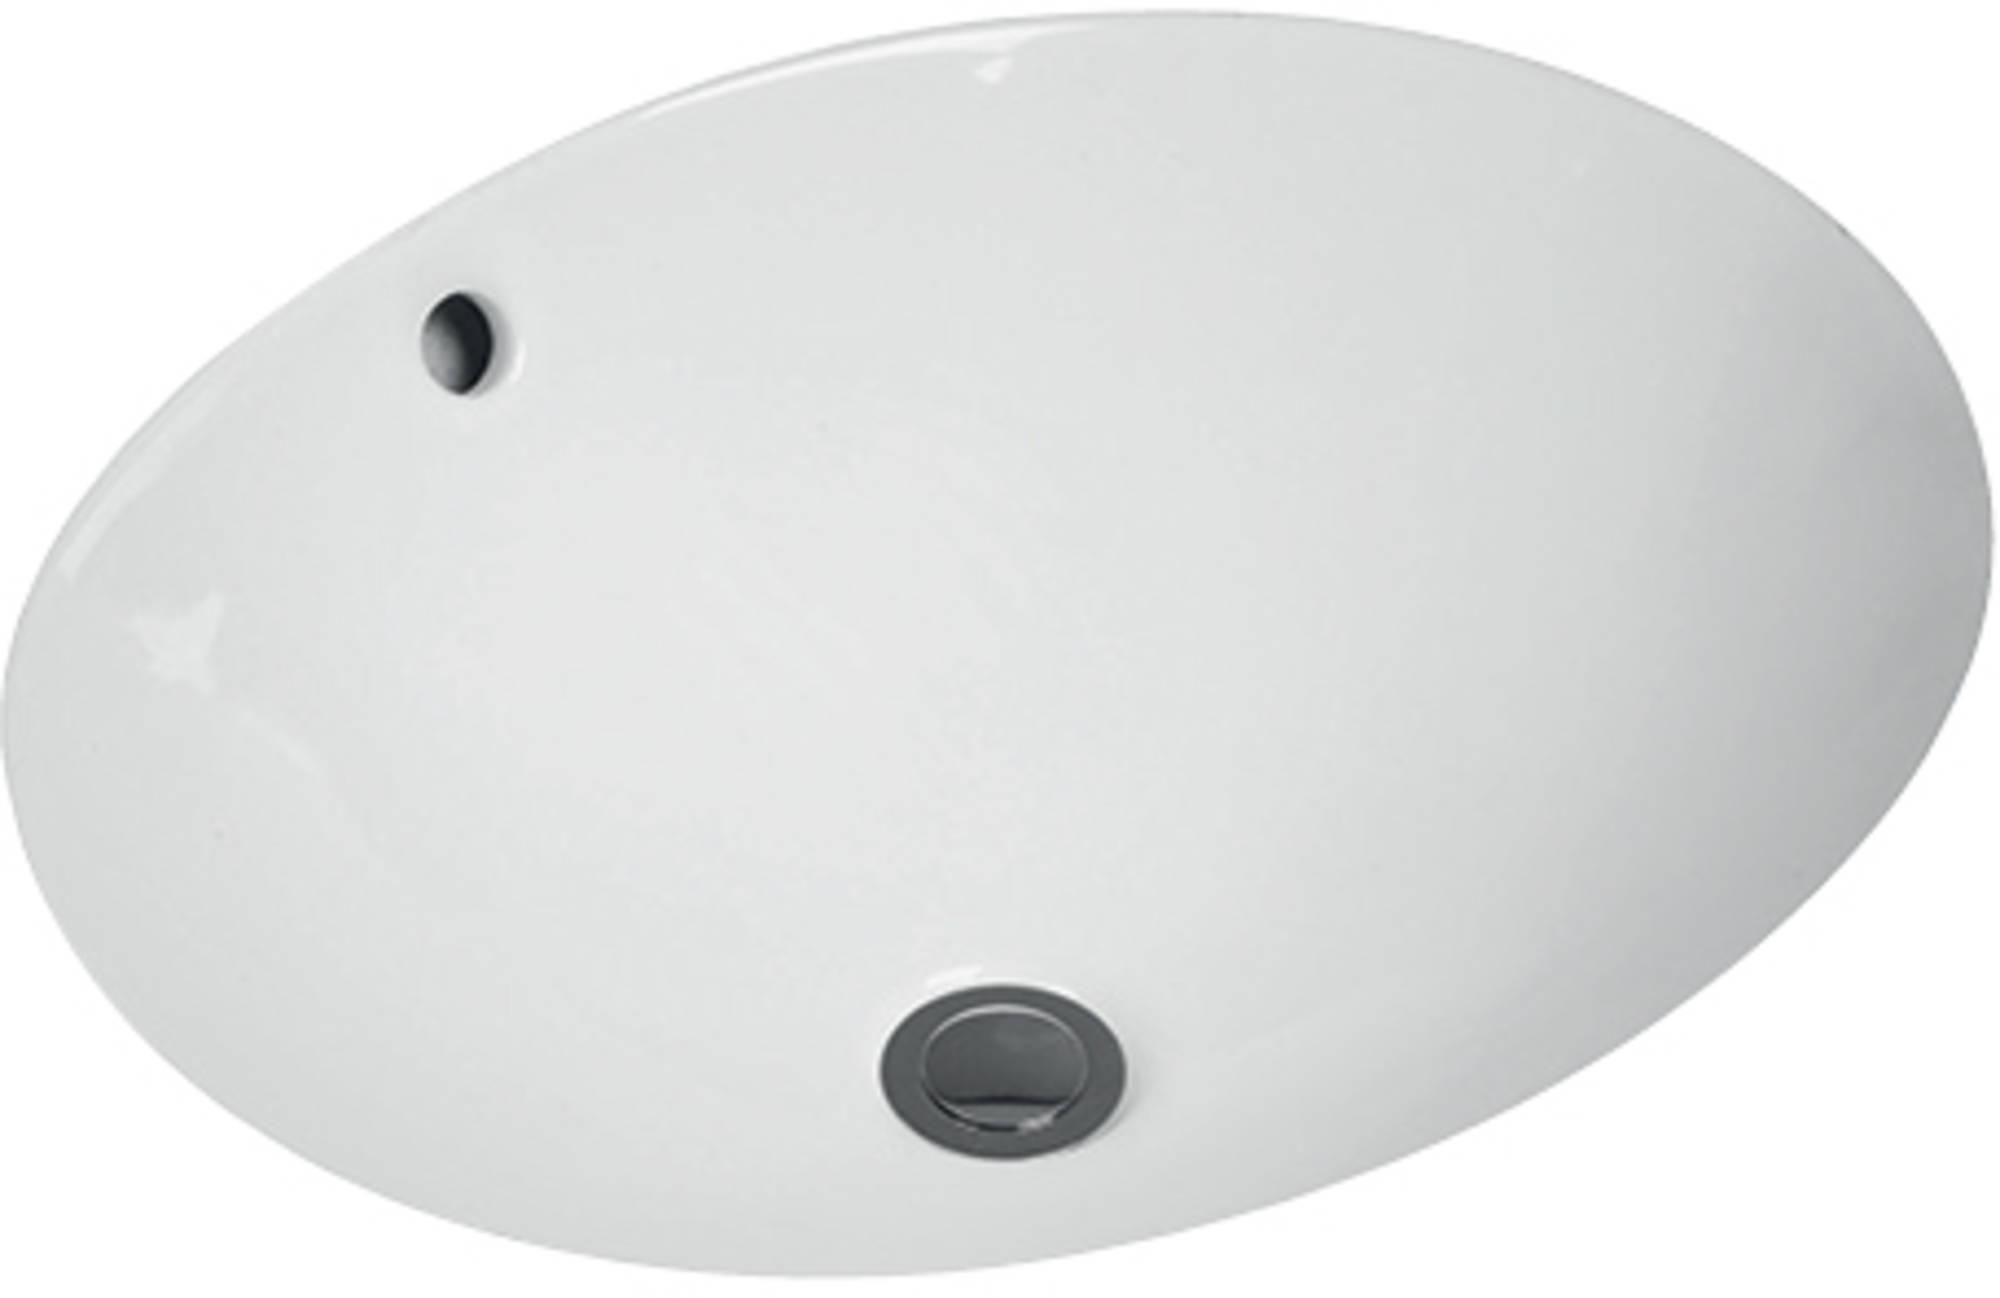 Villeroy & Boch O.novo Onderbouwwastafel 38x31x21,5cm wit alpin